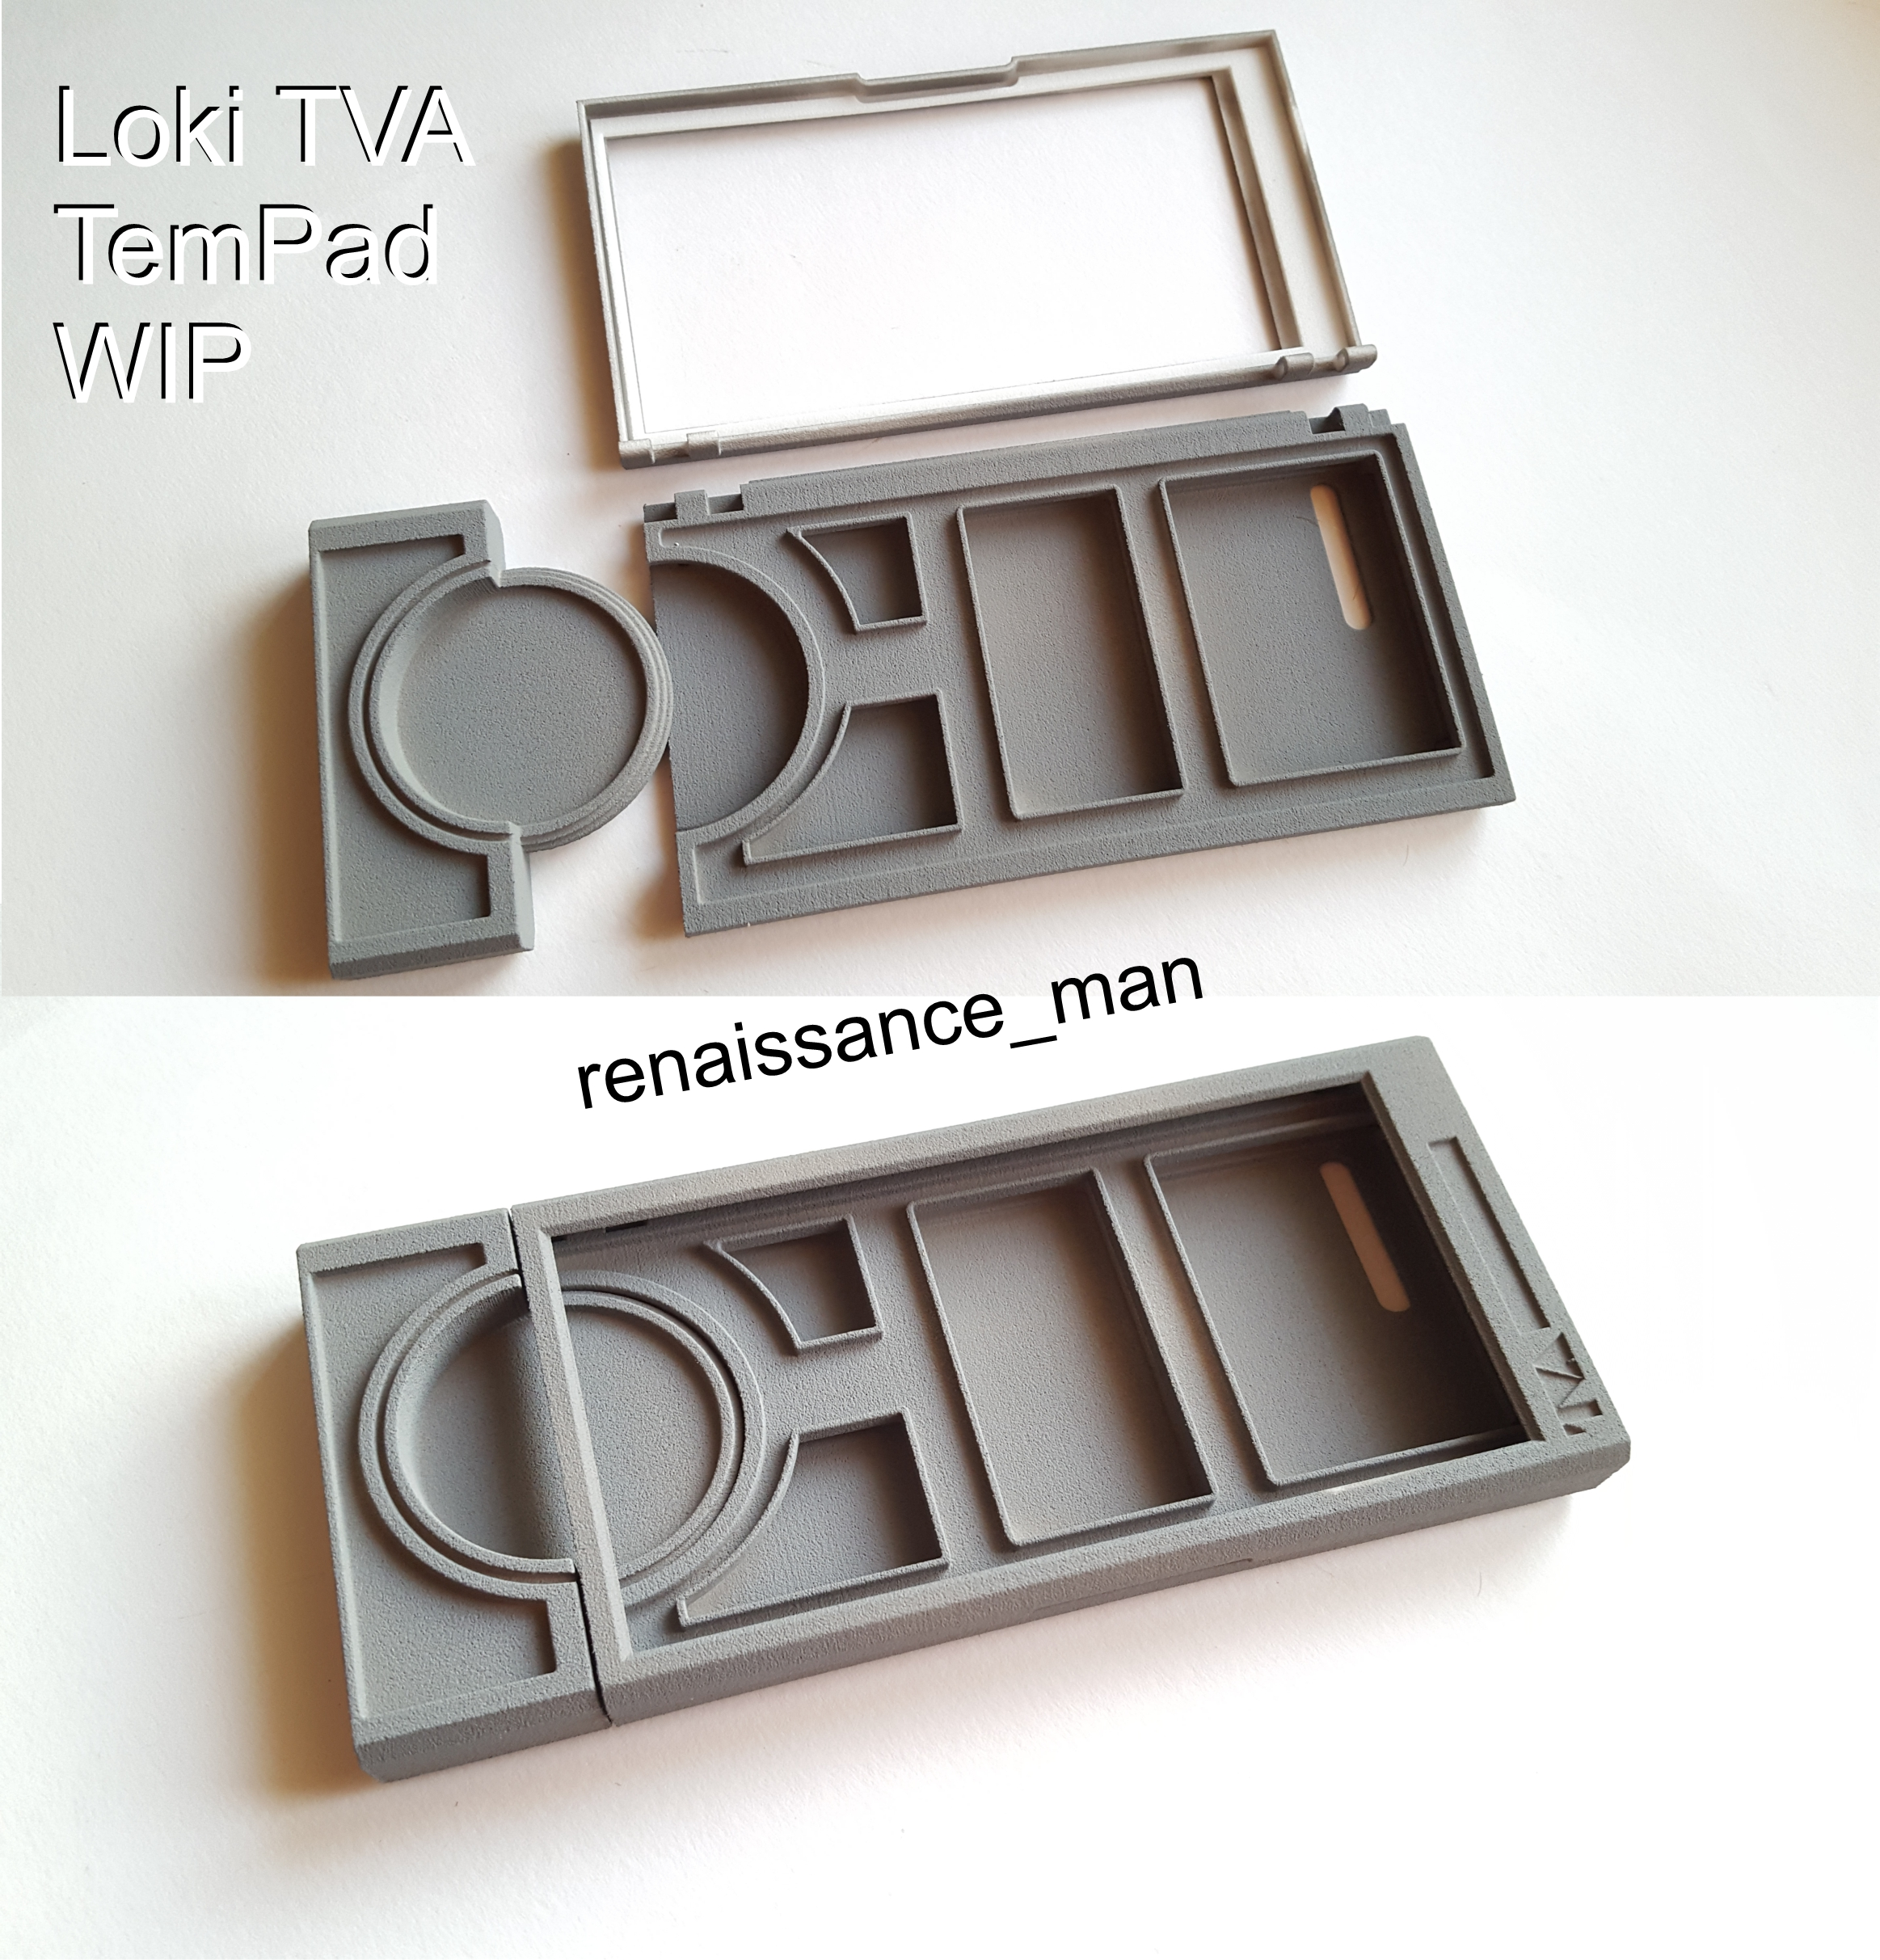 TVA-Tem-Pad-WIP-2.jpg